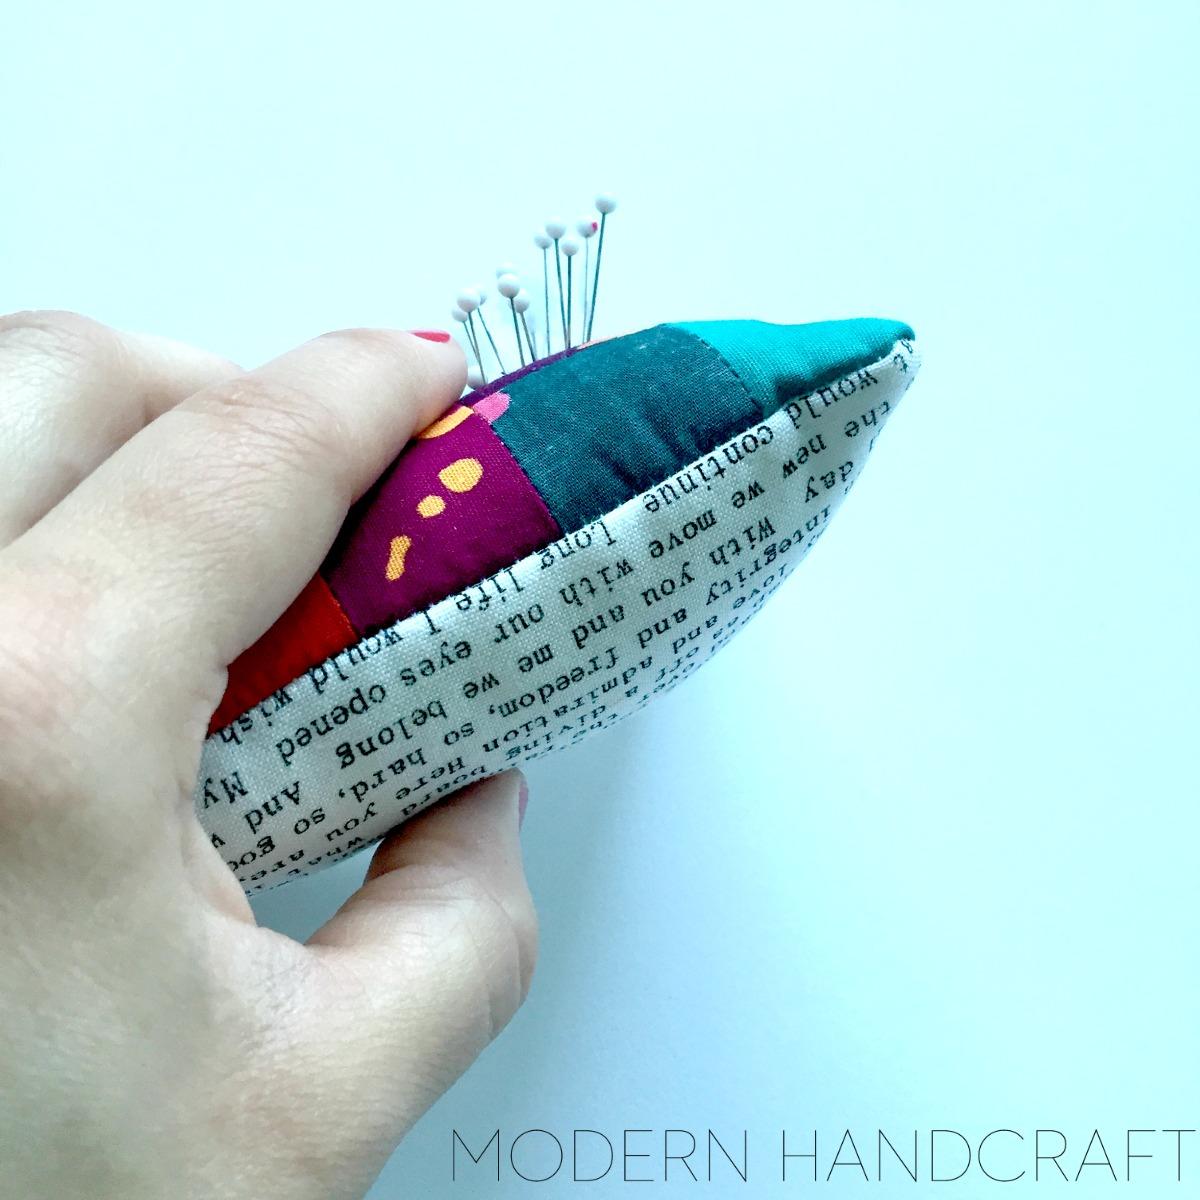 Modern Handcraft: Pretty Pincushion Sew Along with FQS